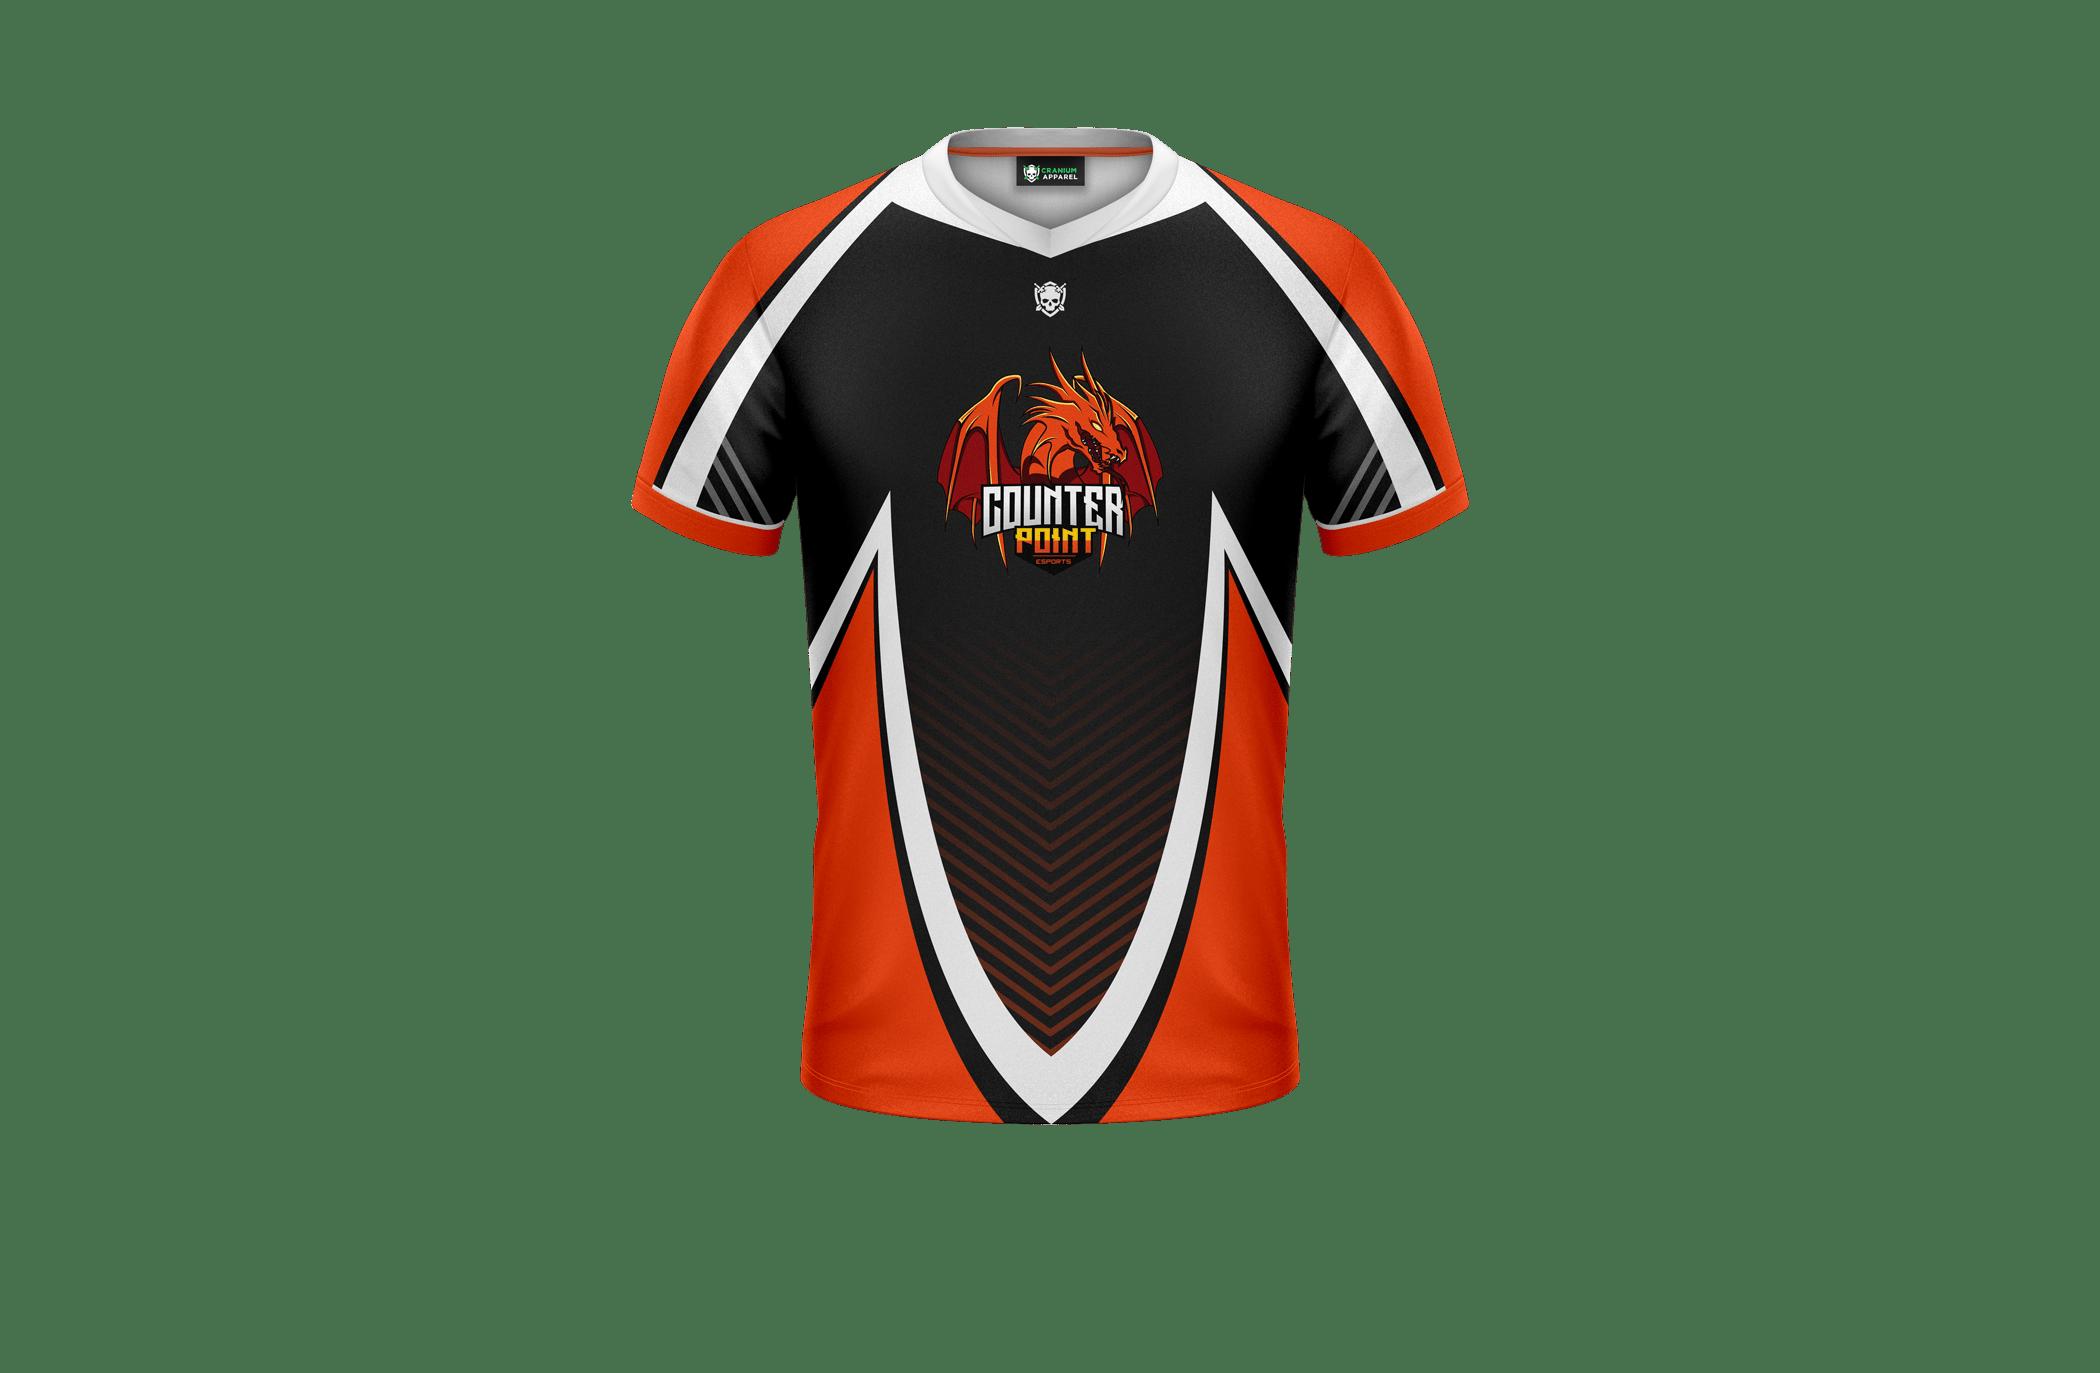 304411b83 Counterpoint Esports Jersey – Cranium Apparel